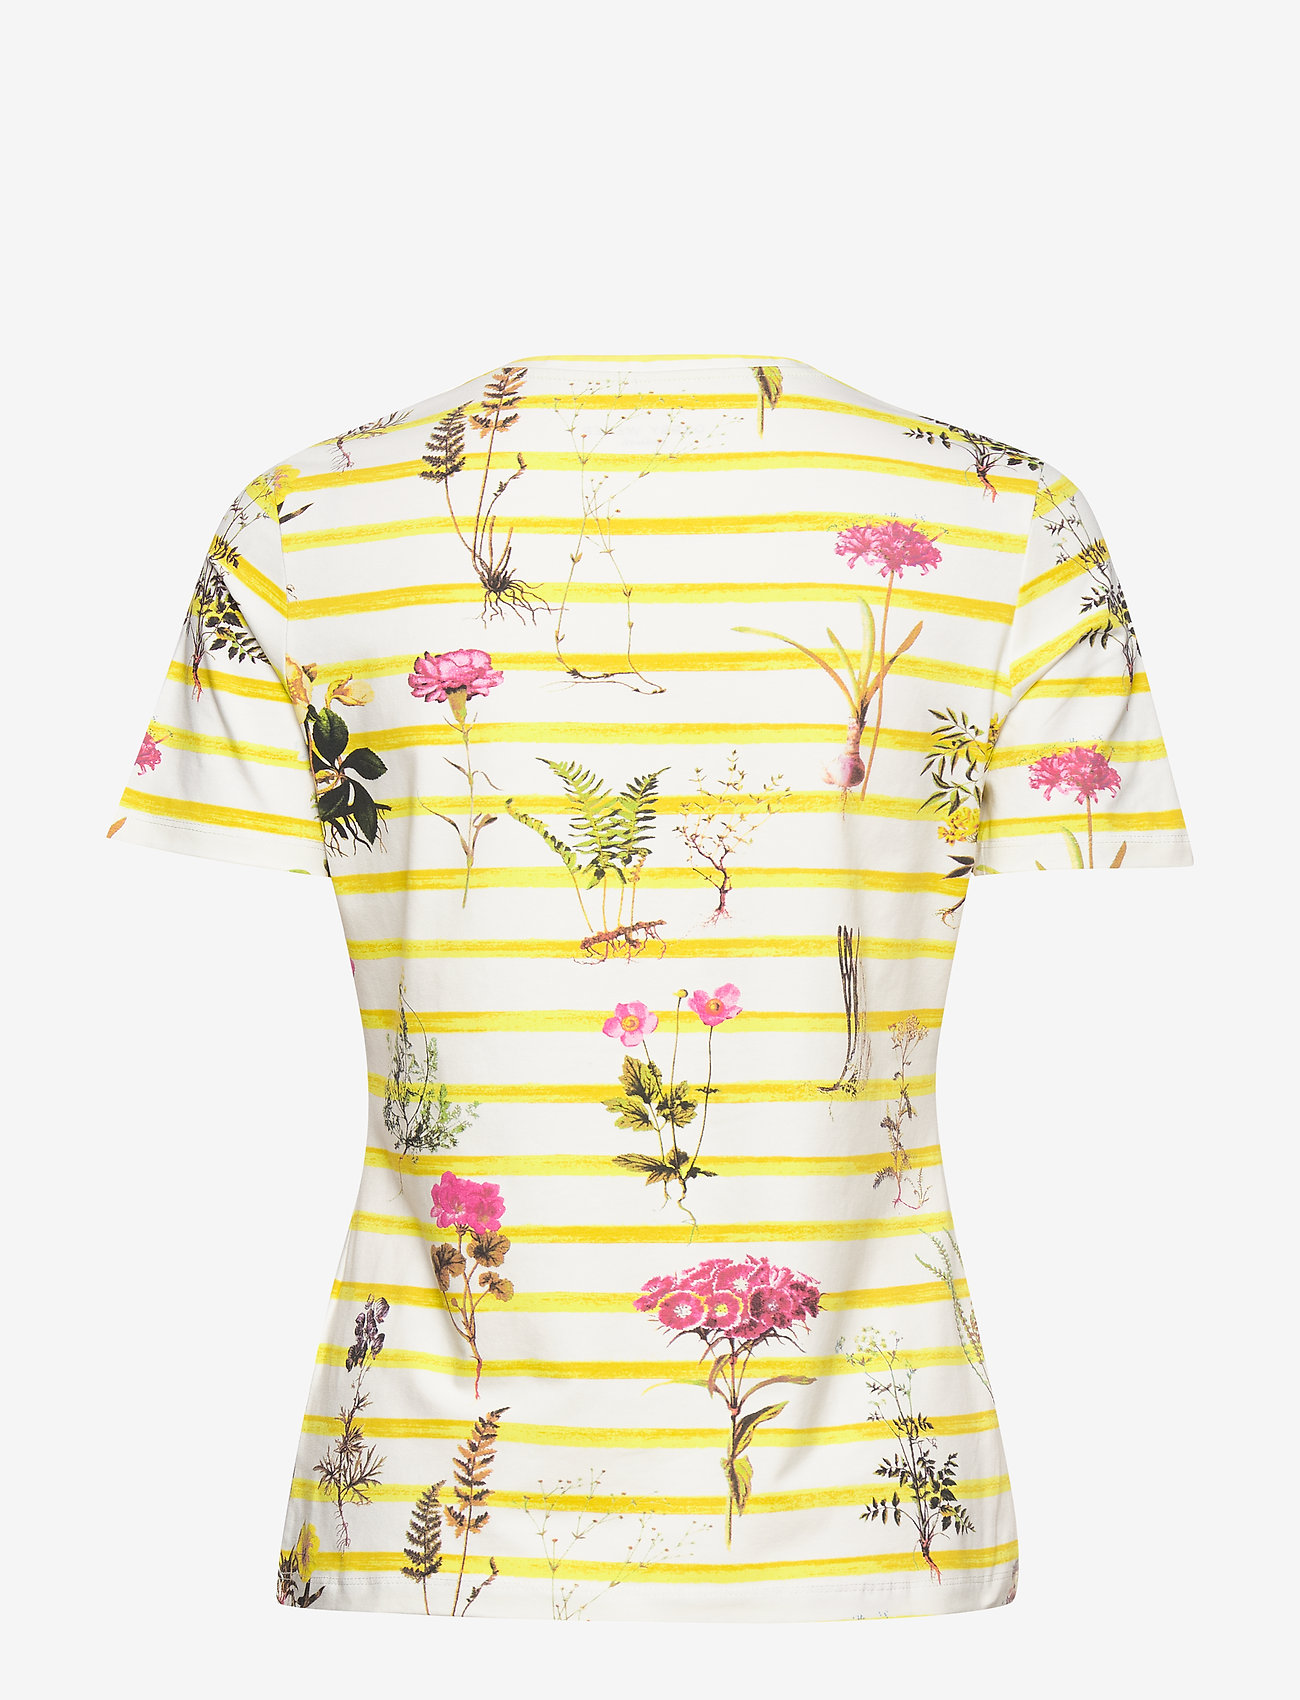 T-shirt Short-sleeve (Green/lilac/pink Stripes) - Gerry Weber Edition osbM2b